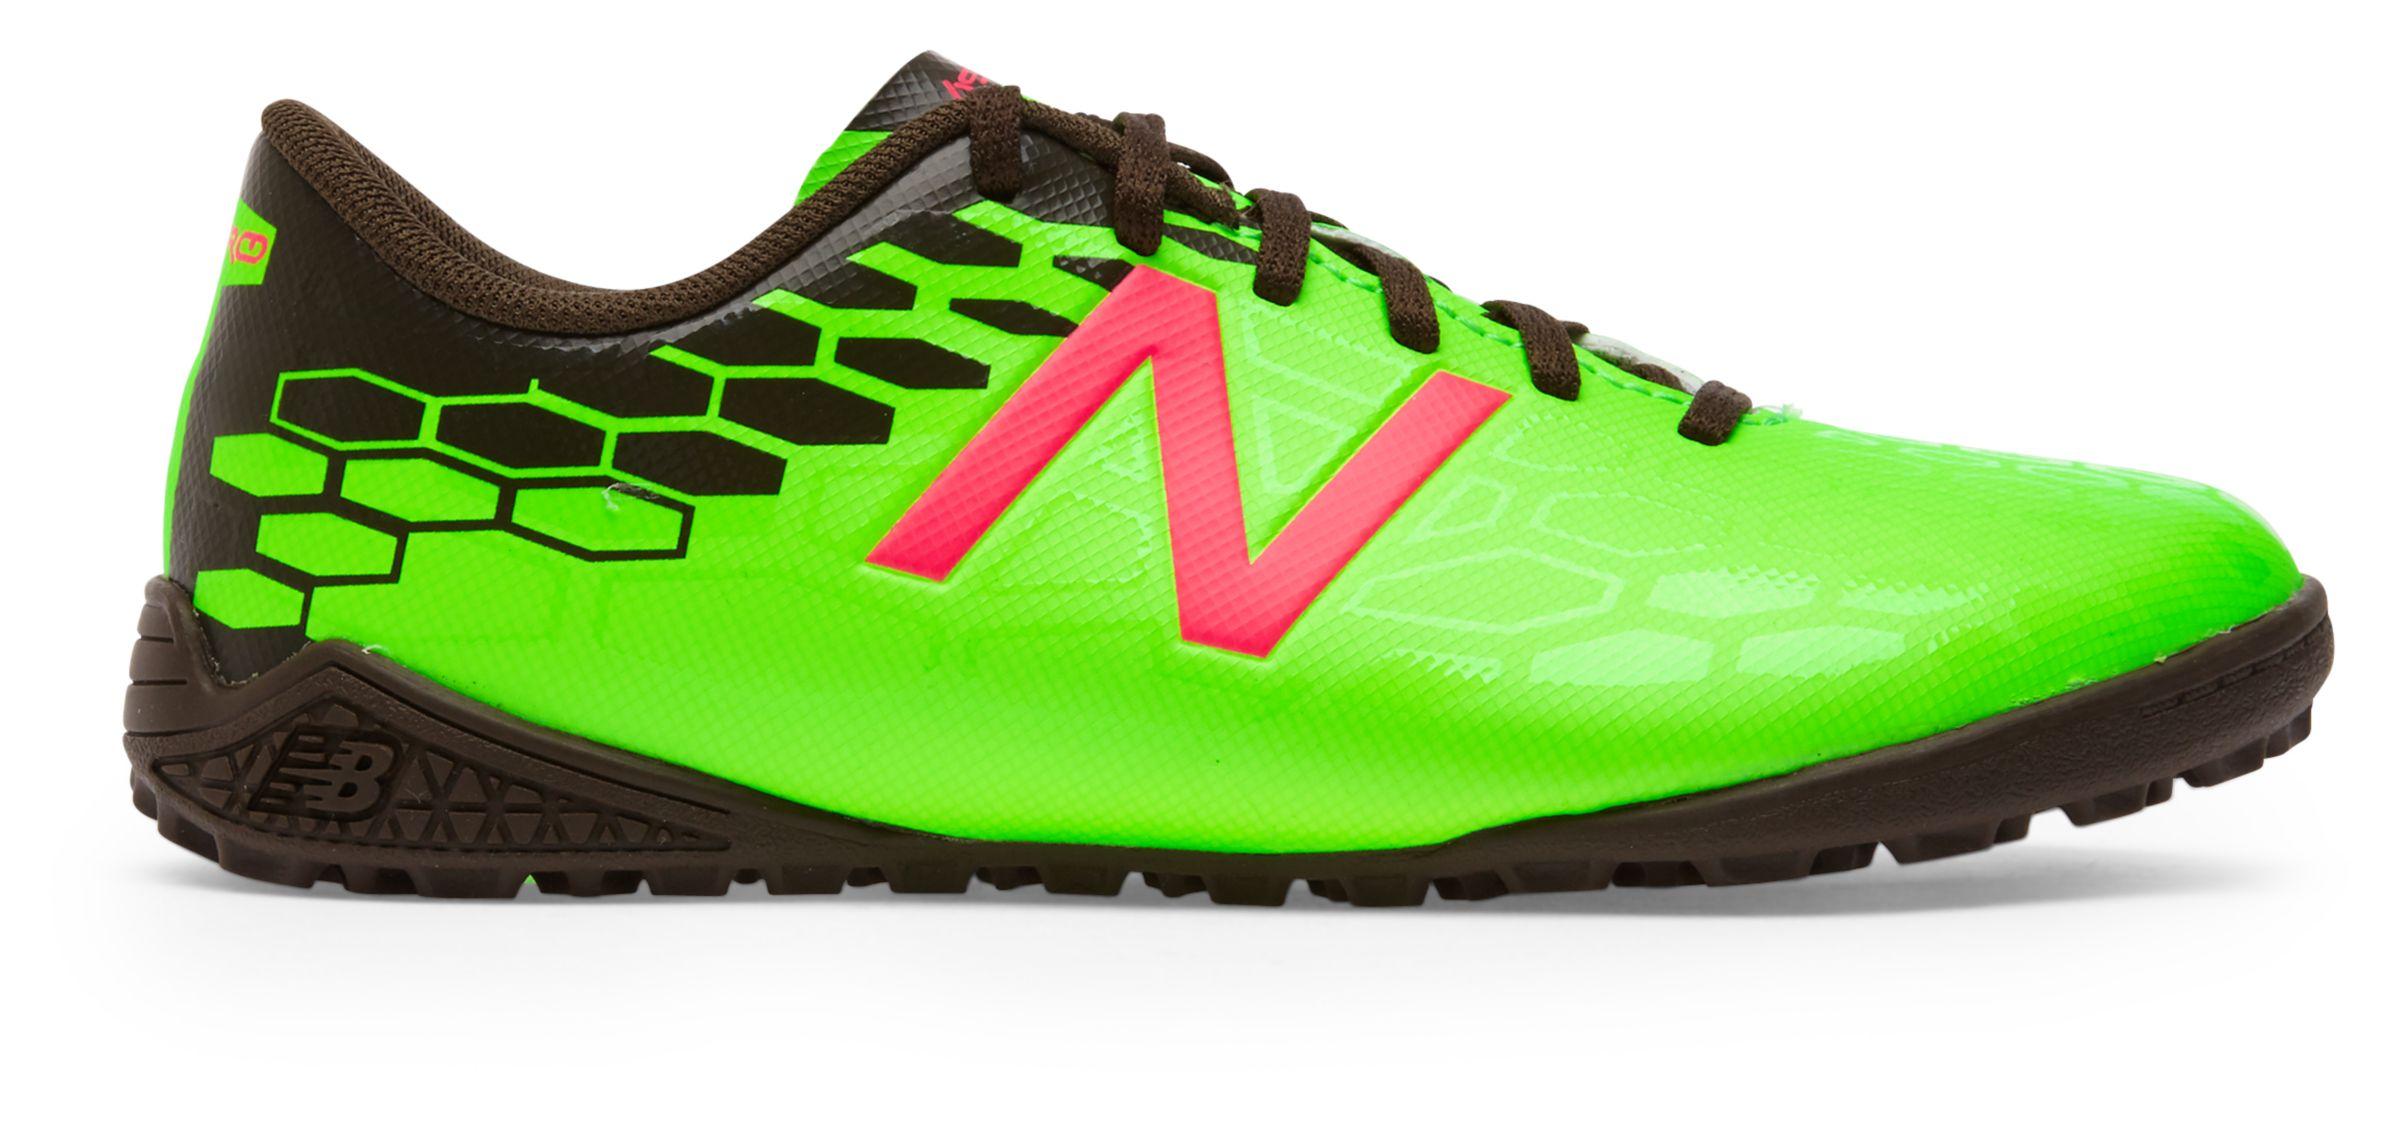 NB Junior Visaro 2.0 Control TF, Energy Lime with Military Dark Triumph & Alpha Pink